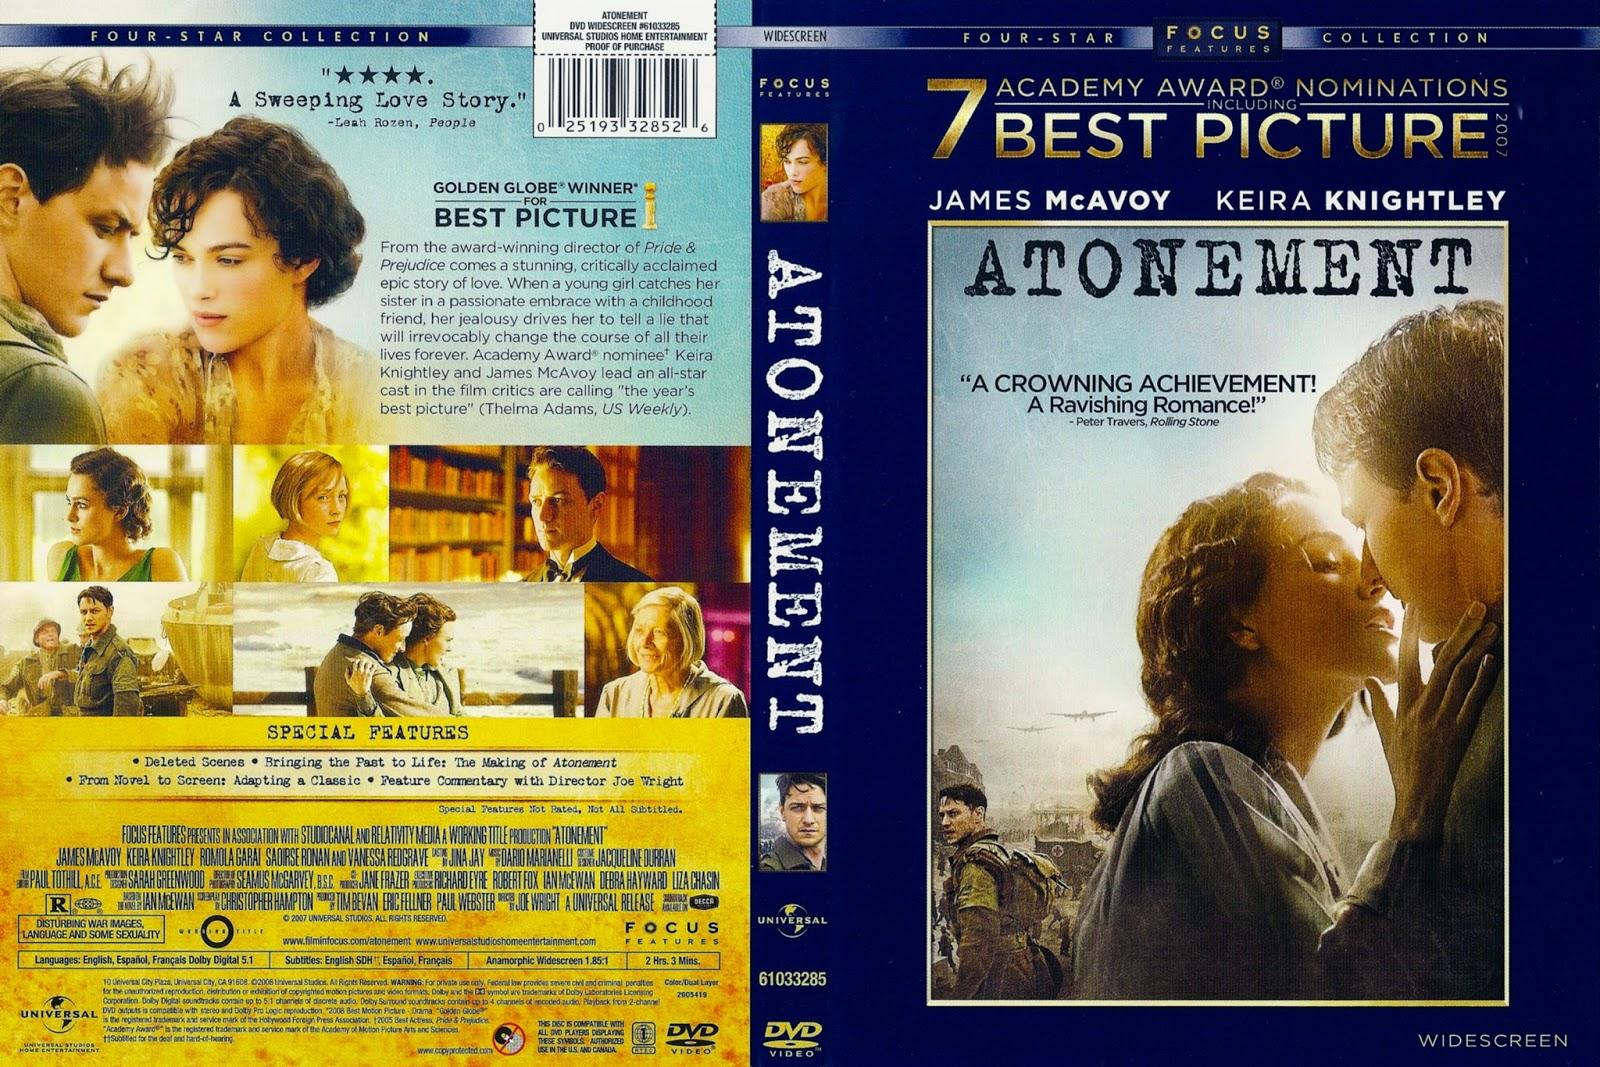 NAZI JERMAN: Dijual! DVD Film Nazi - Drama dan Romansa